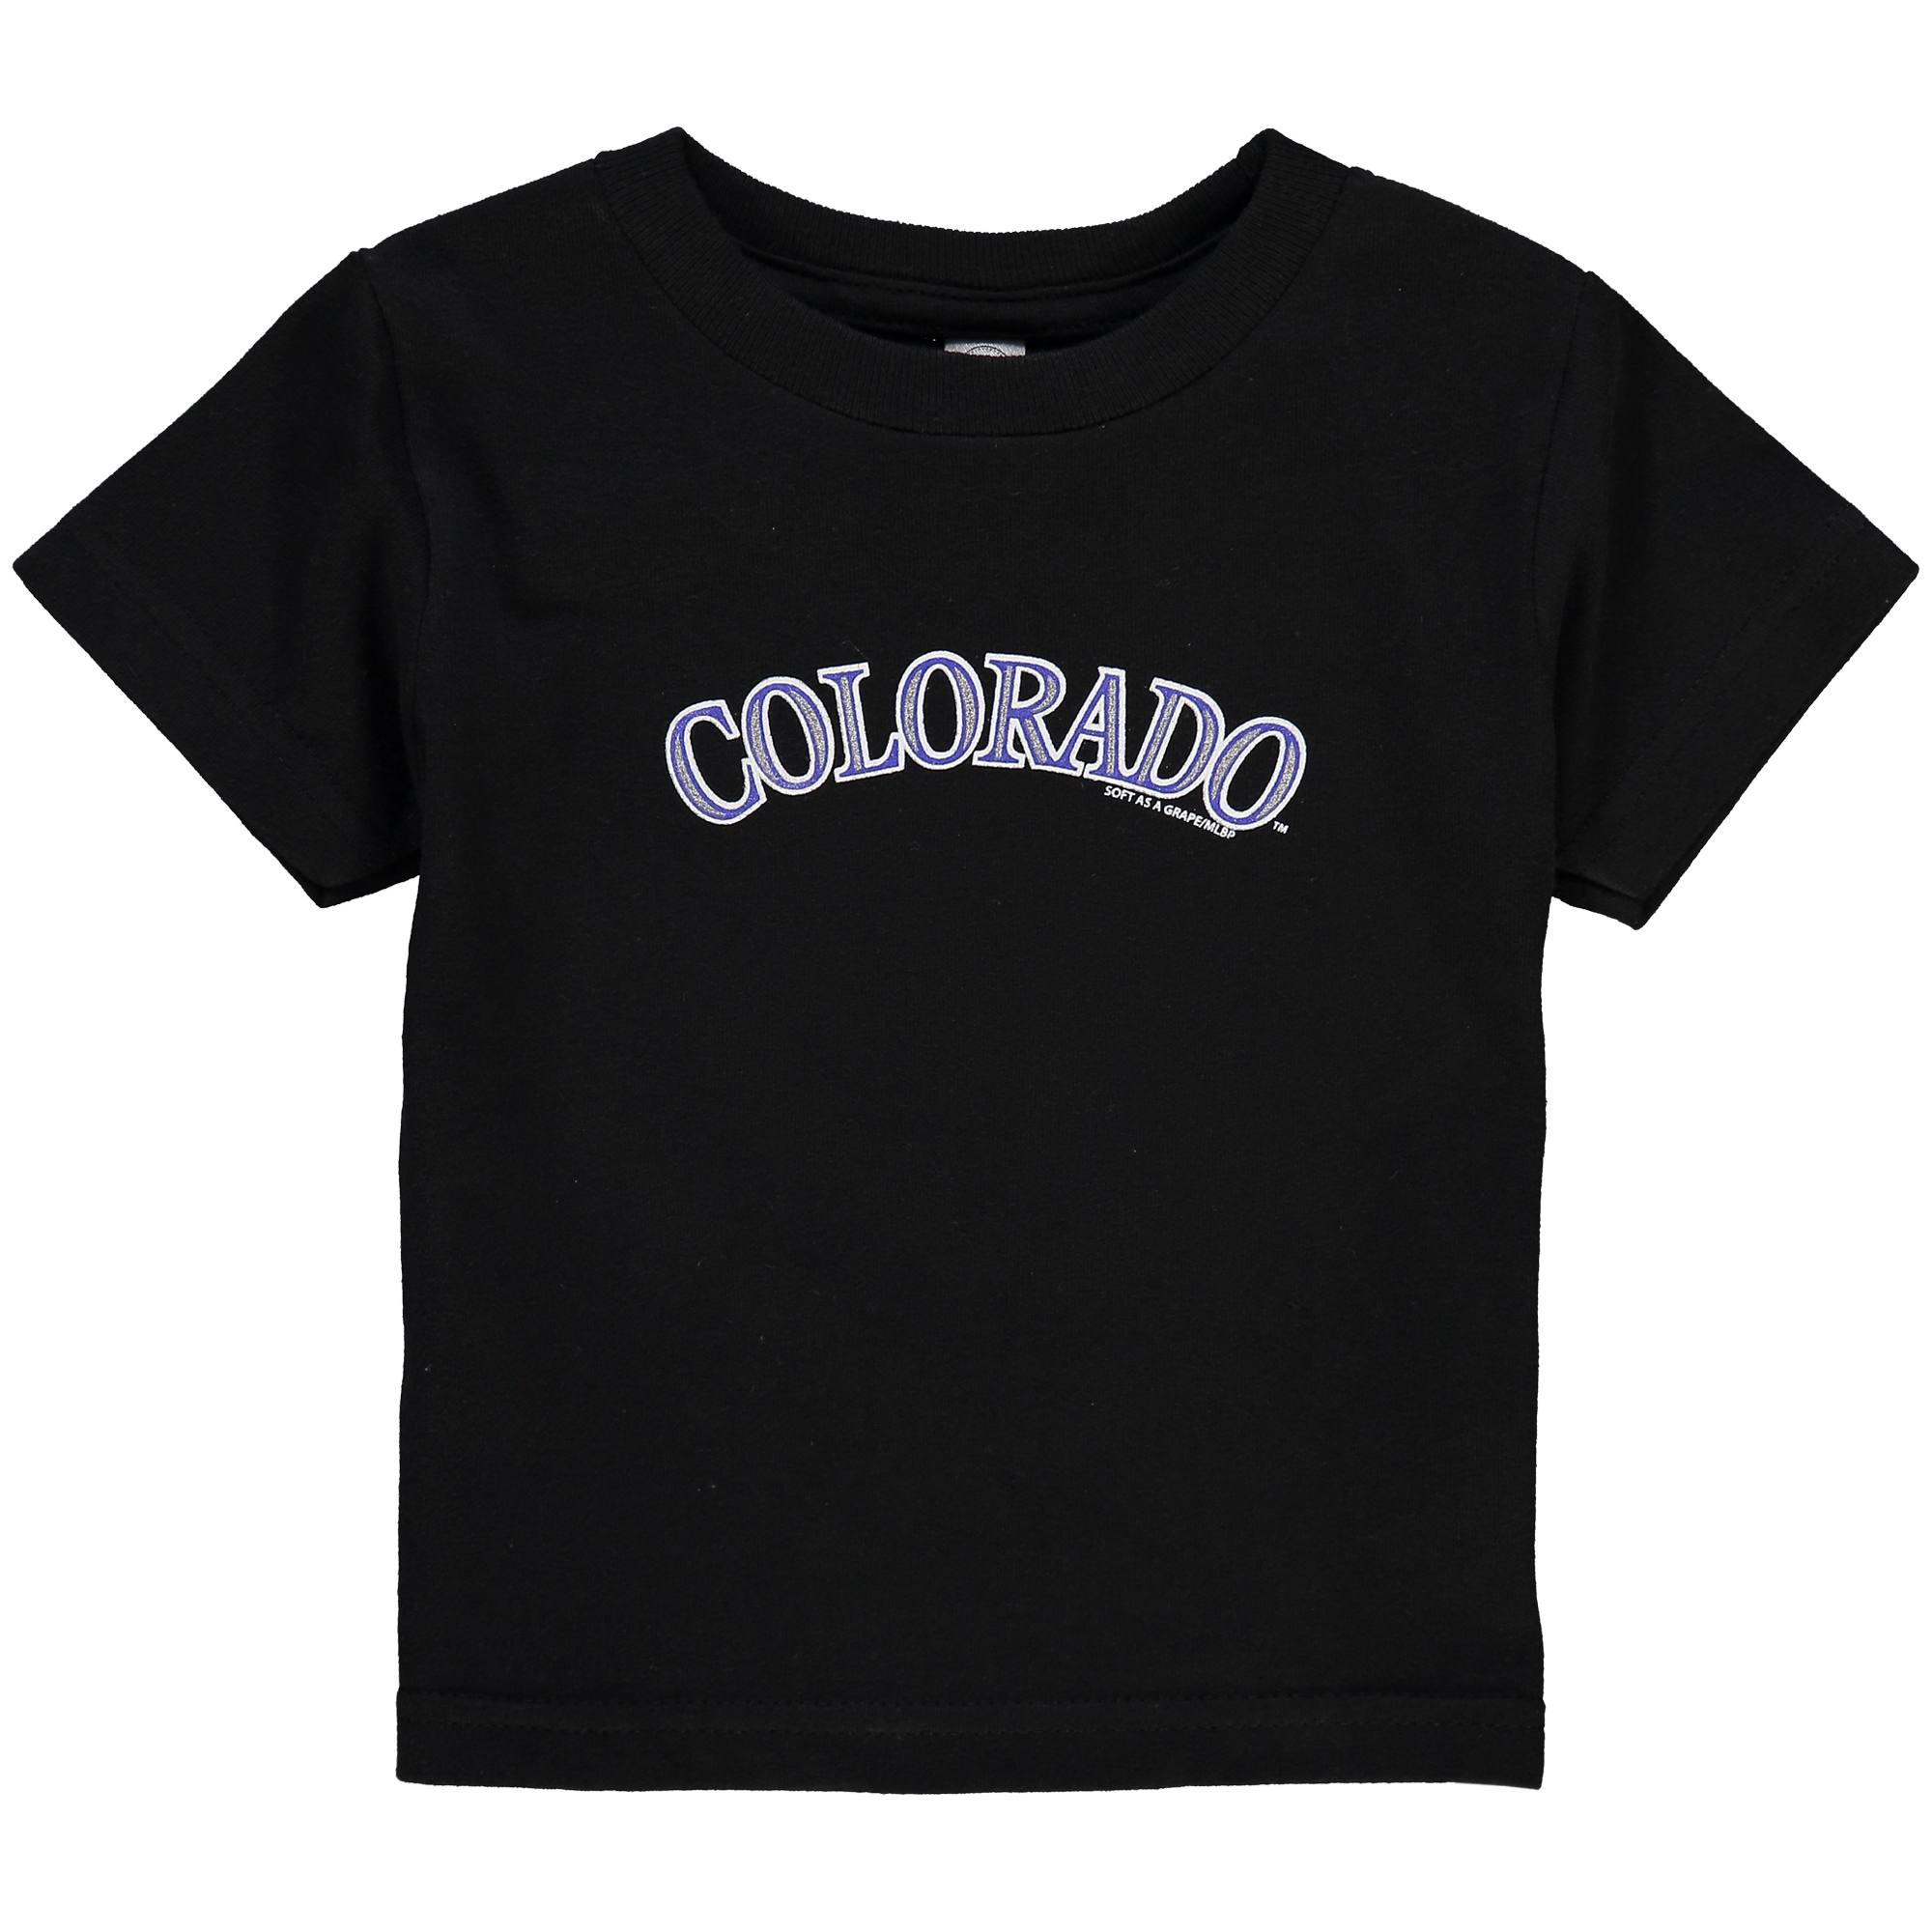 Colorado Rockies Soft As A Grape Toddler Tiny Fan Wordmark T-Shirt - Black